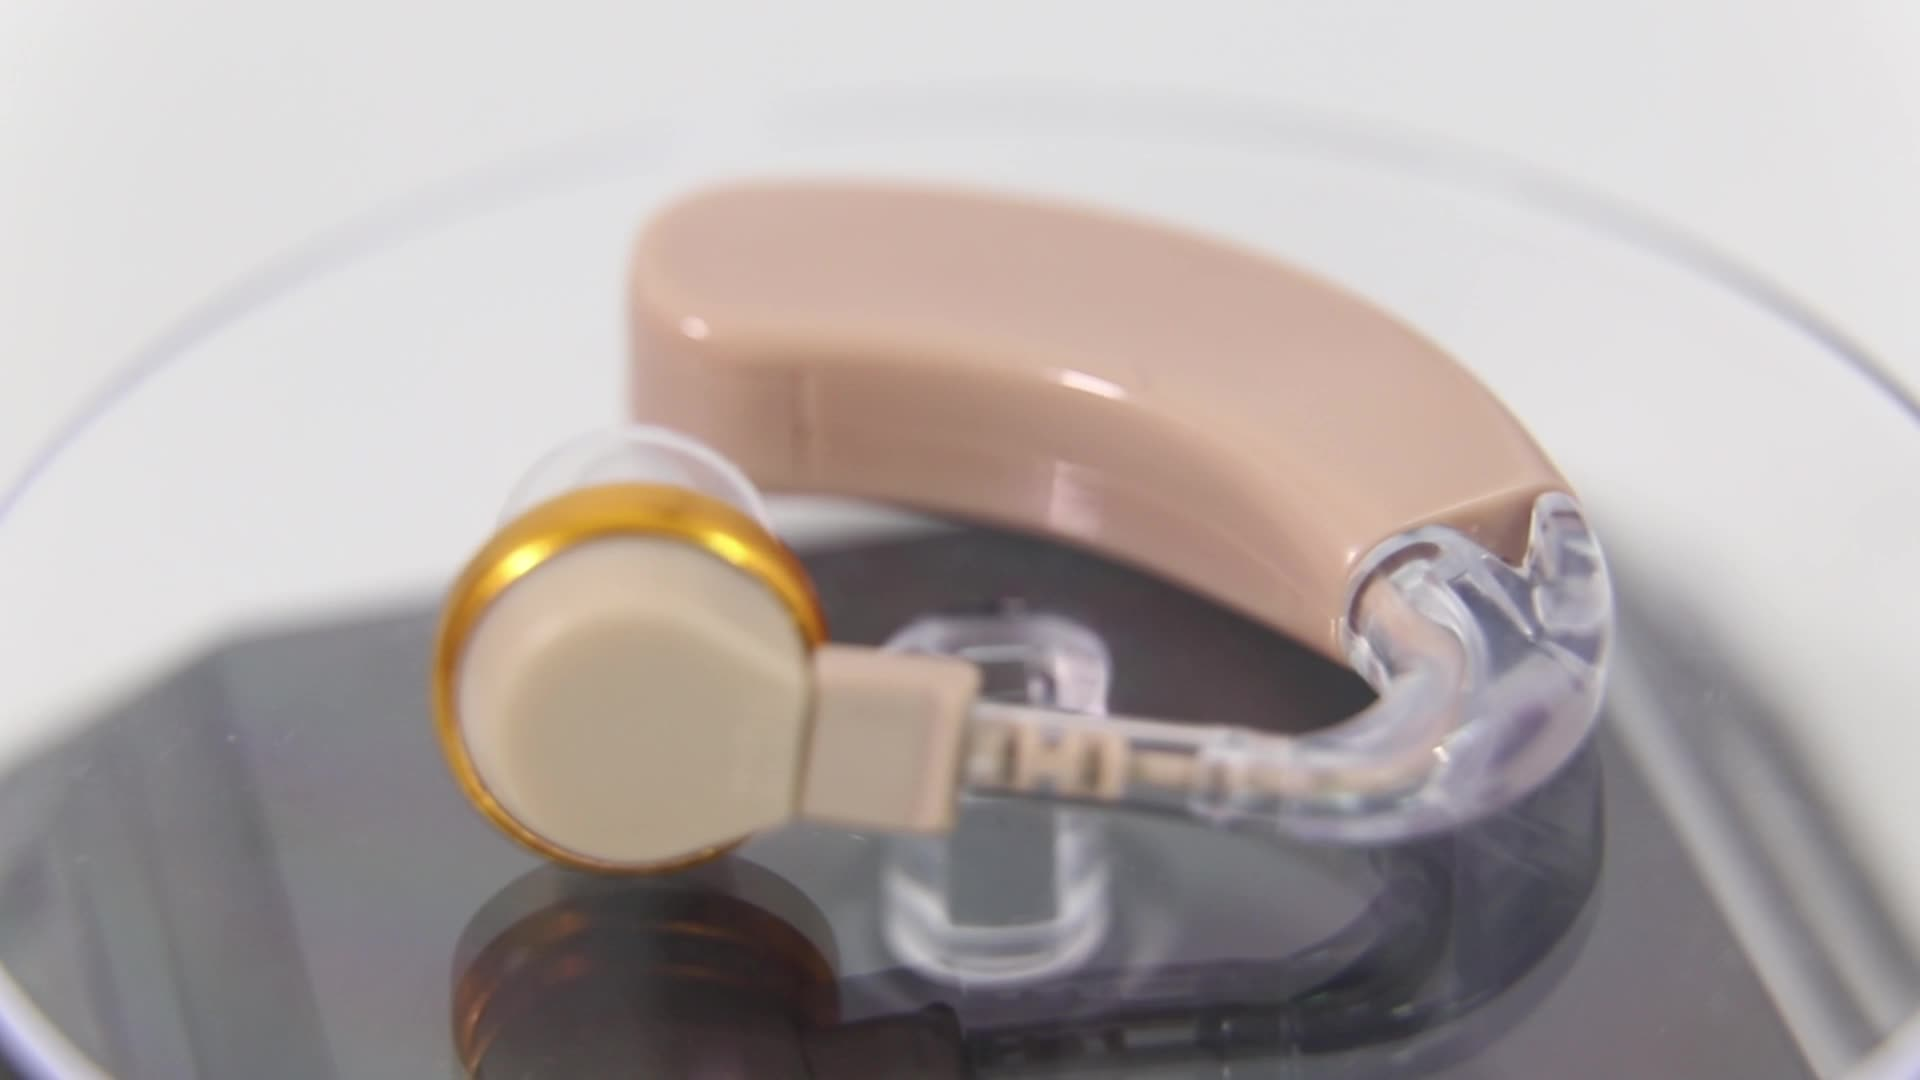 High Quality Cheap Price External BTE Analog Hearing Aids